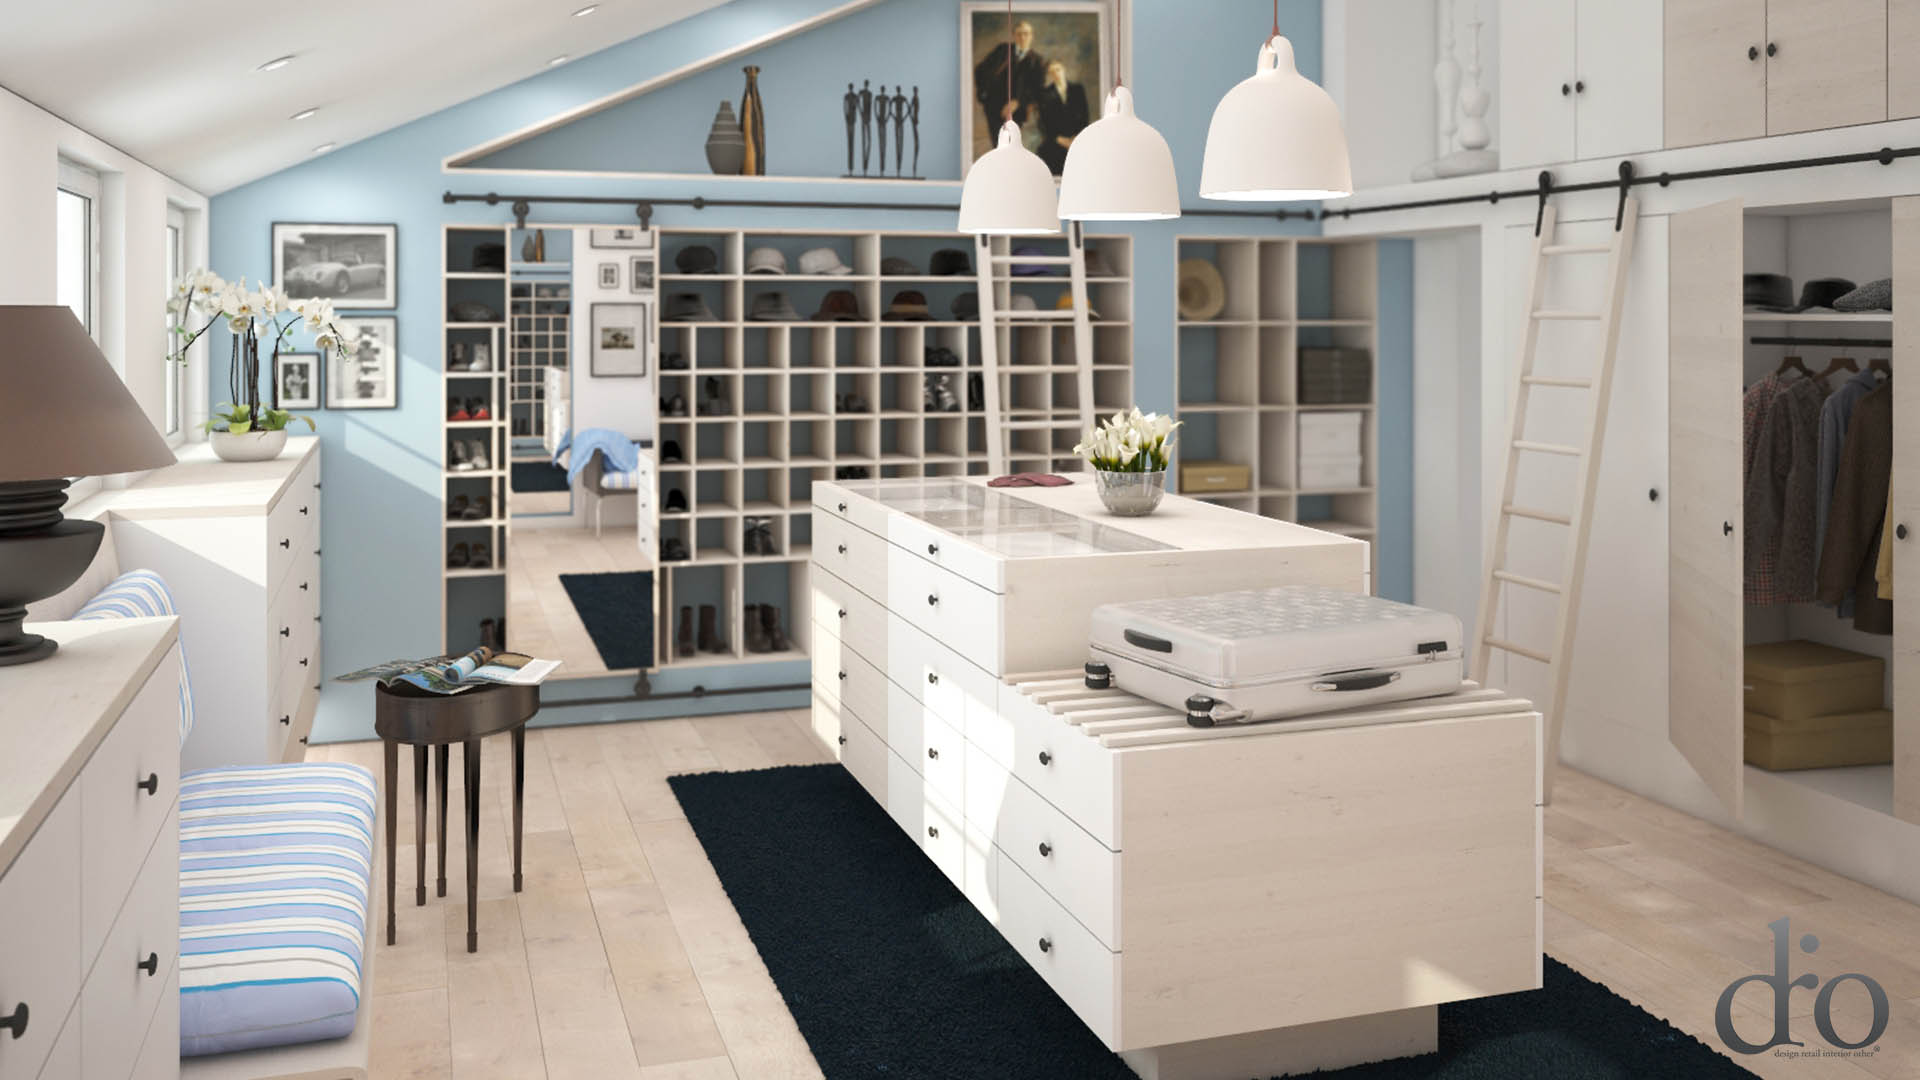 ladenbau hannover innenarchitekt hannover im drio design. Black Bedroom Furniture Sets. Home Design Ideas